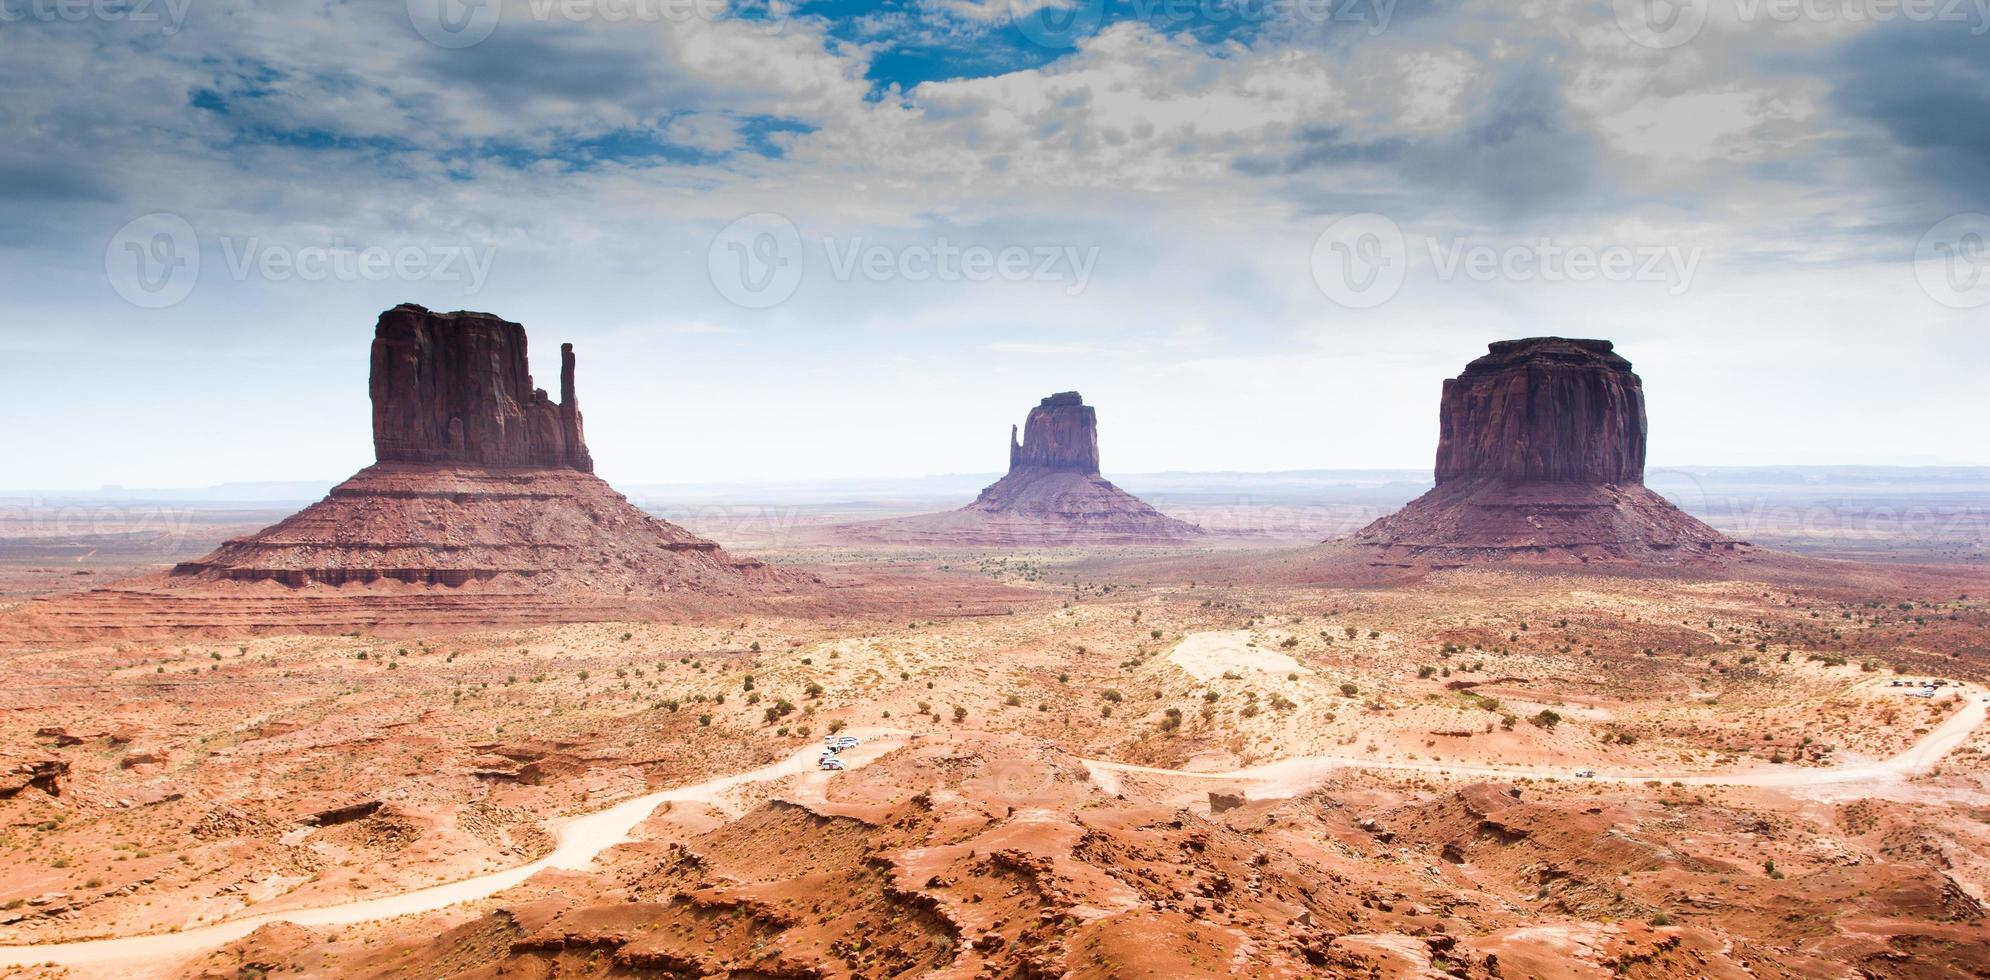 The Monument Valley, Scenics, Estados Unidos foto